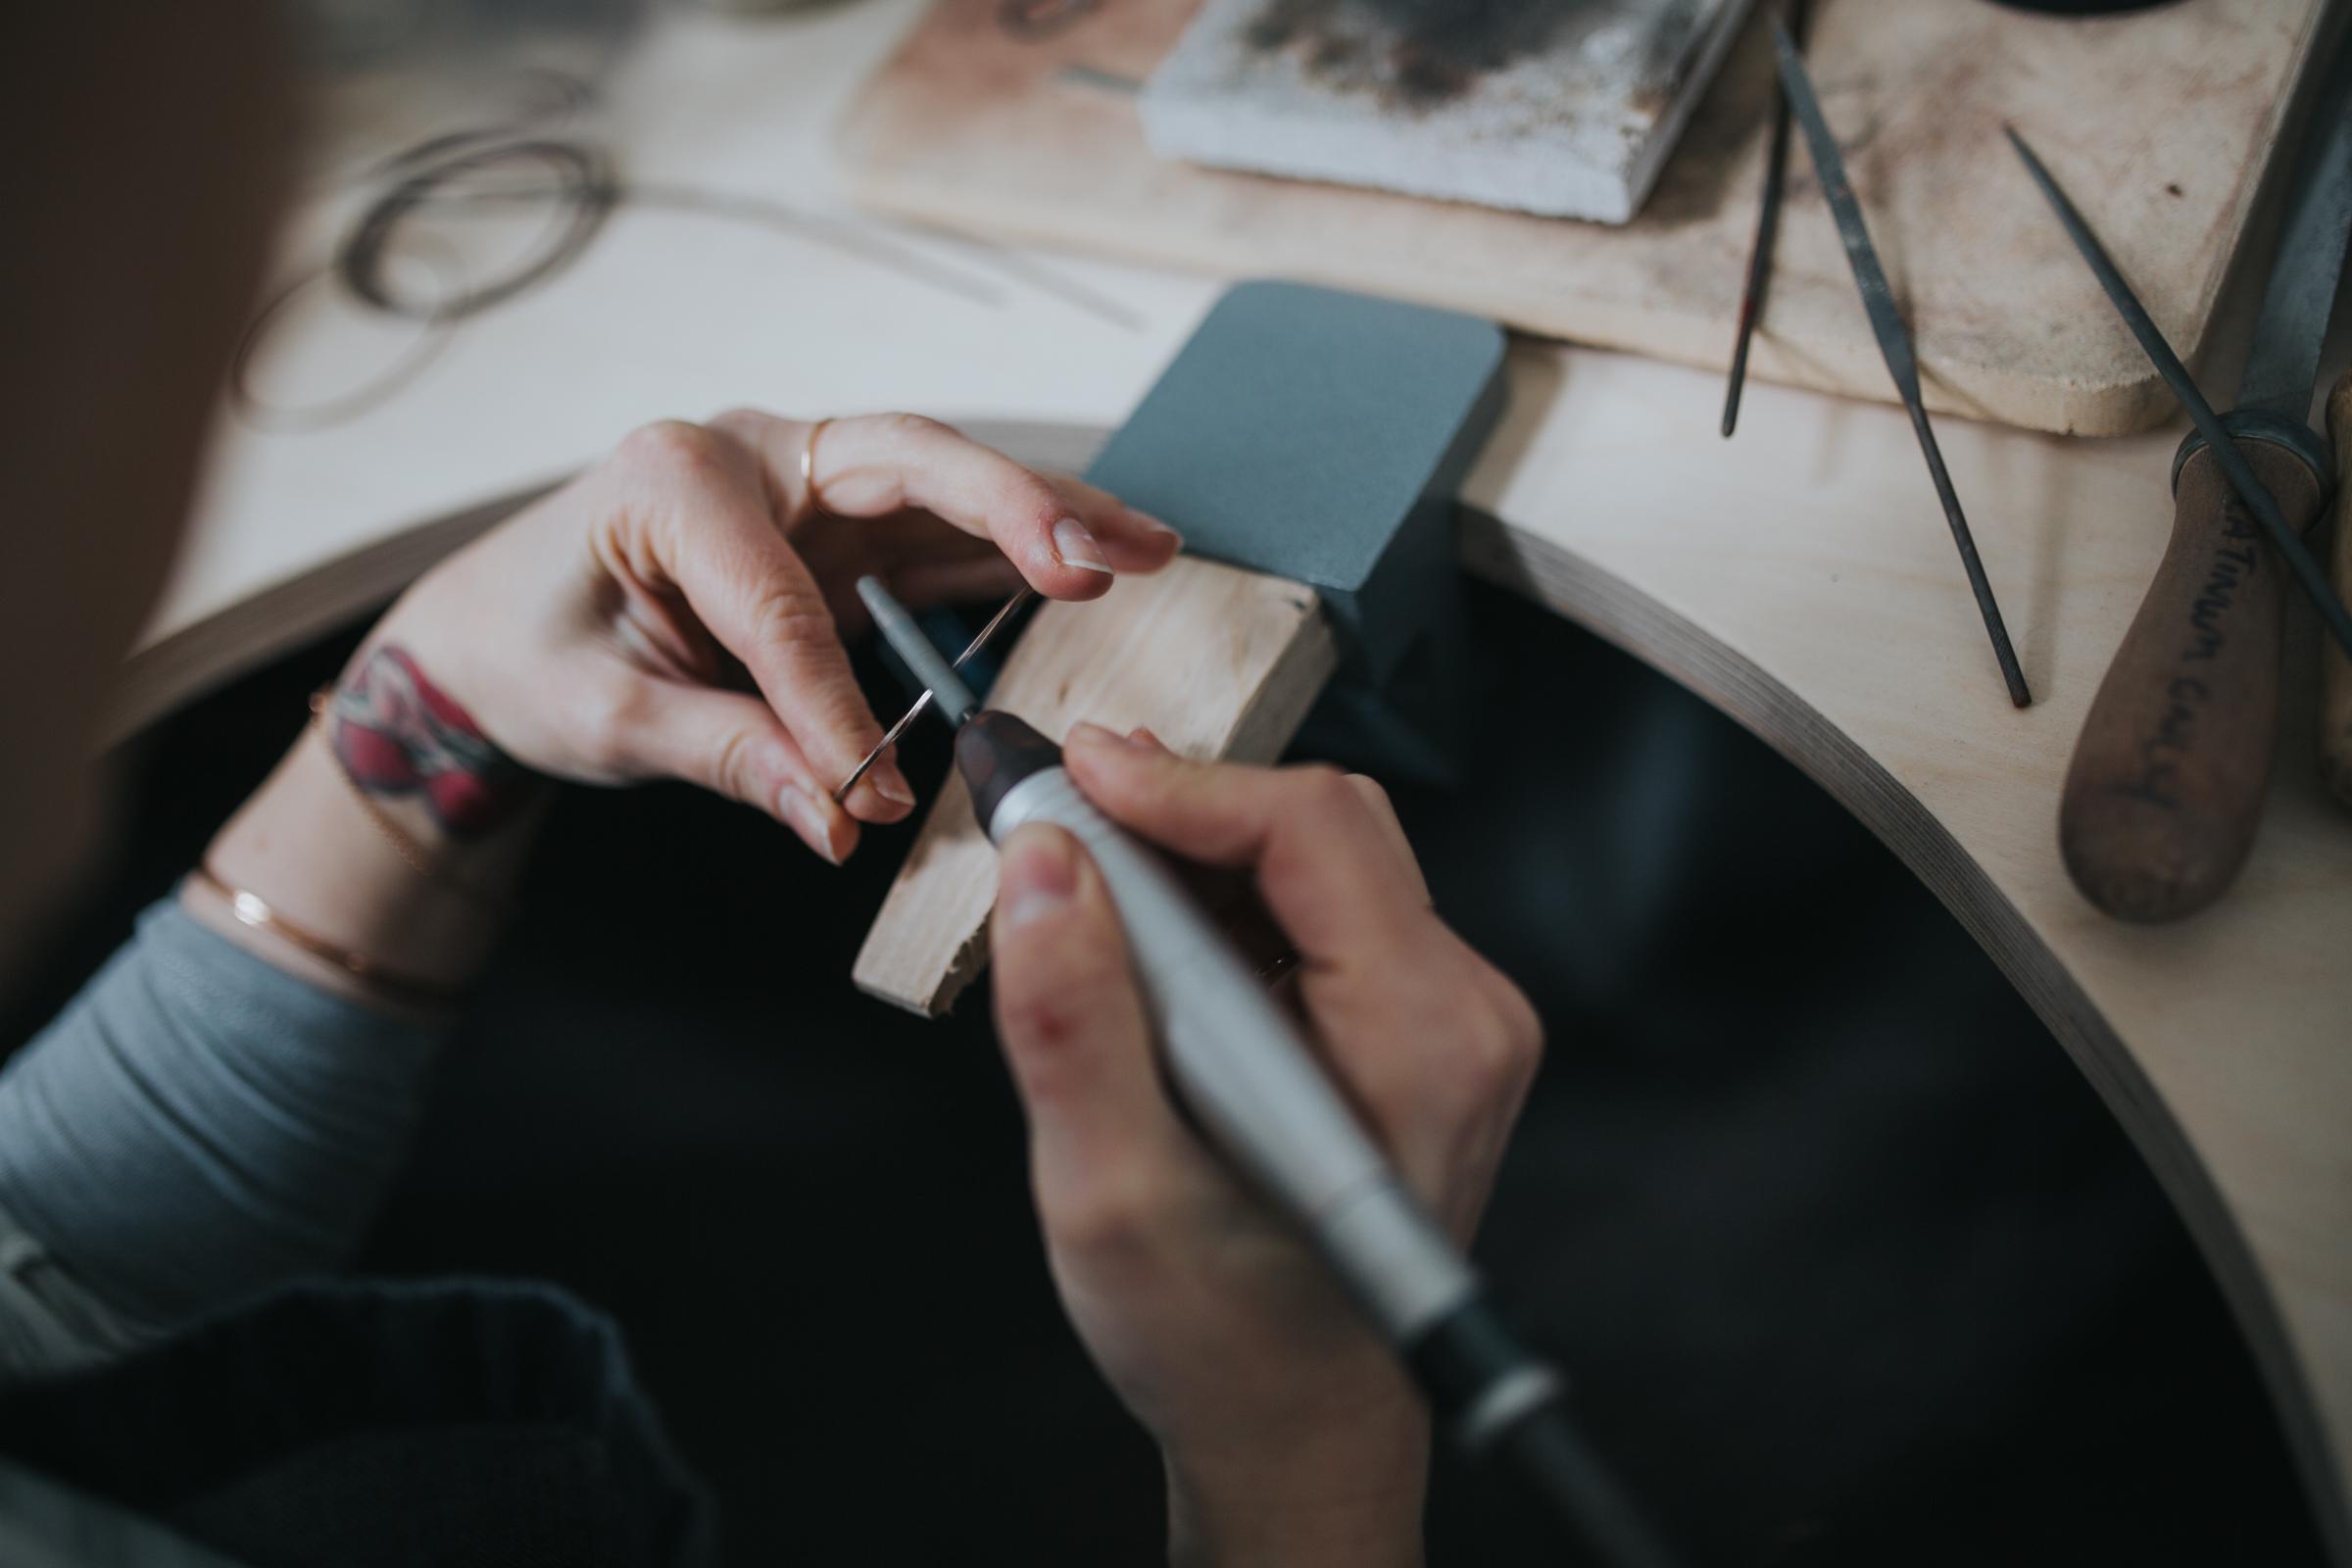 interview-jo-tootsievalentine-fine-designer-jewellery-fair-trade-gold-minas-planet-jasmina-haskovic-london-uk17.jpg